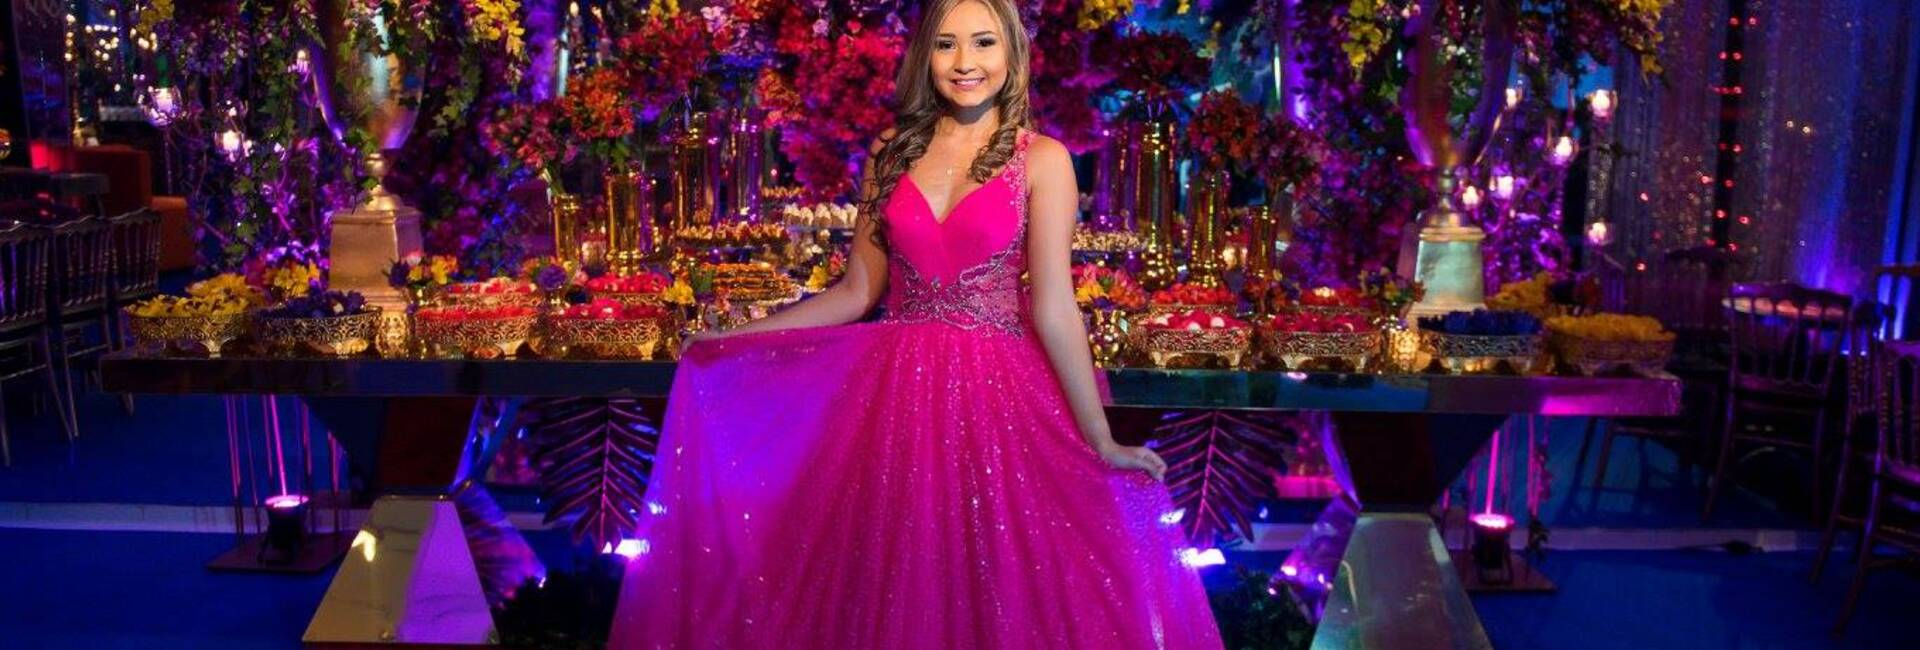 15 anos de Isabelle Castro